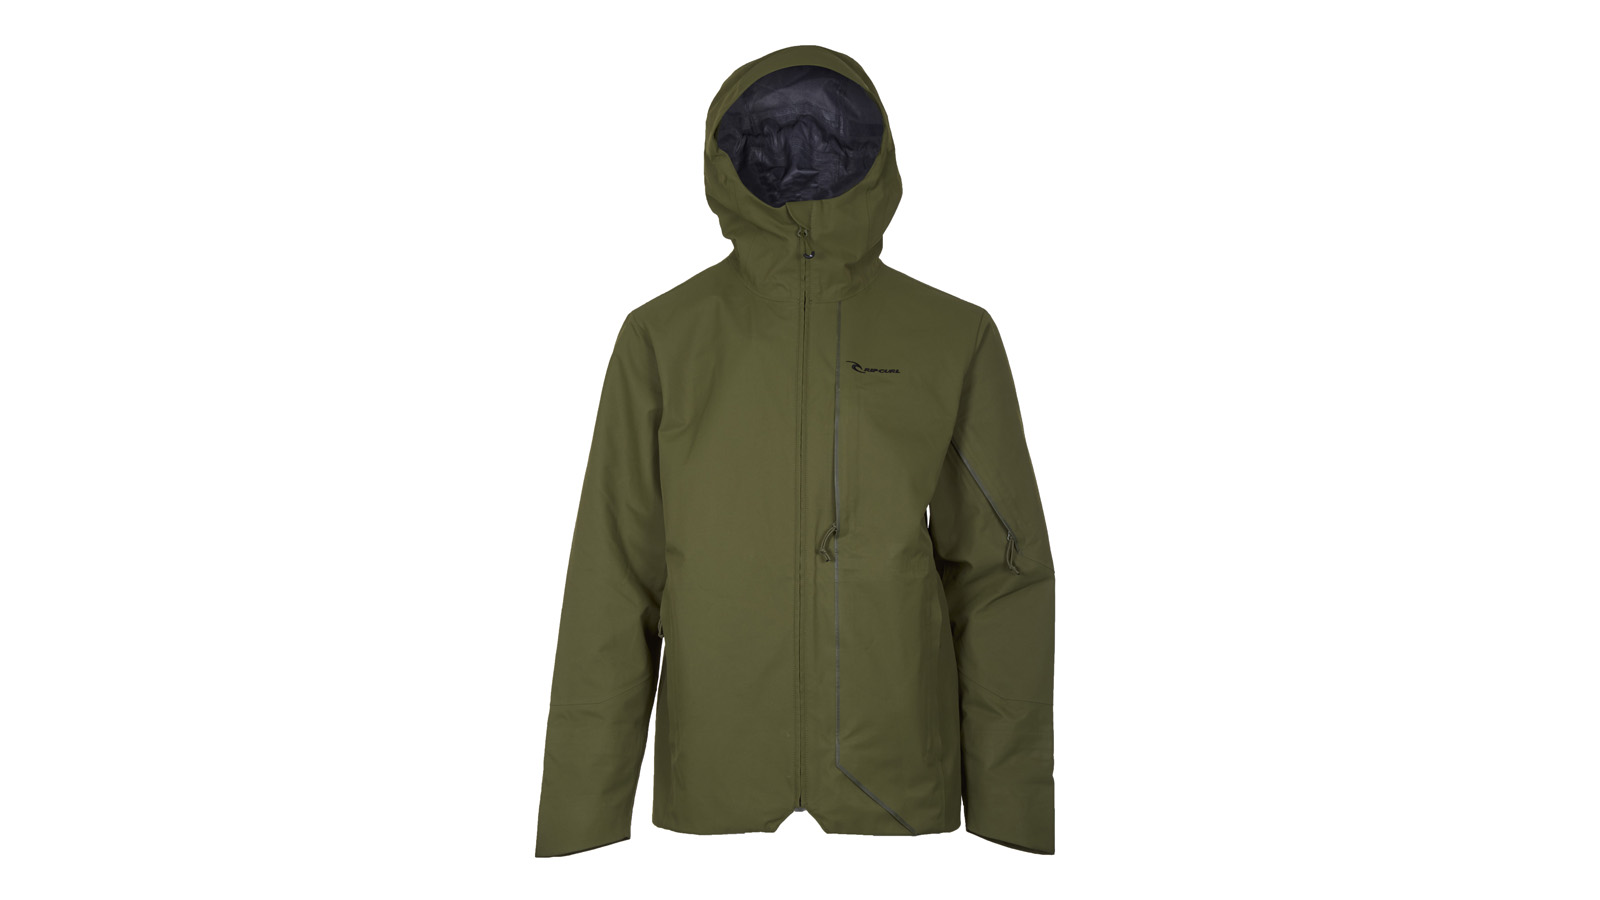 Pro Search 3L Jacket